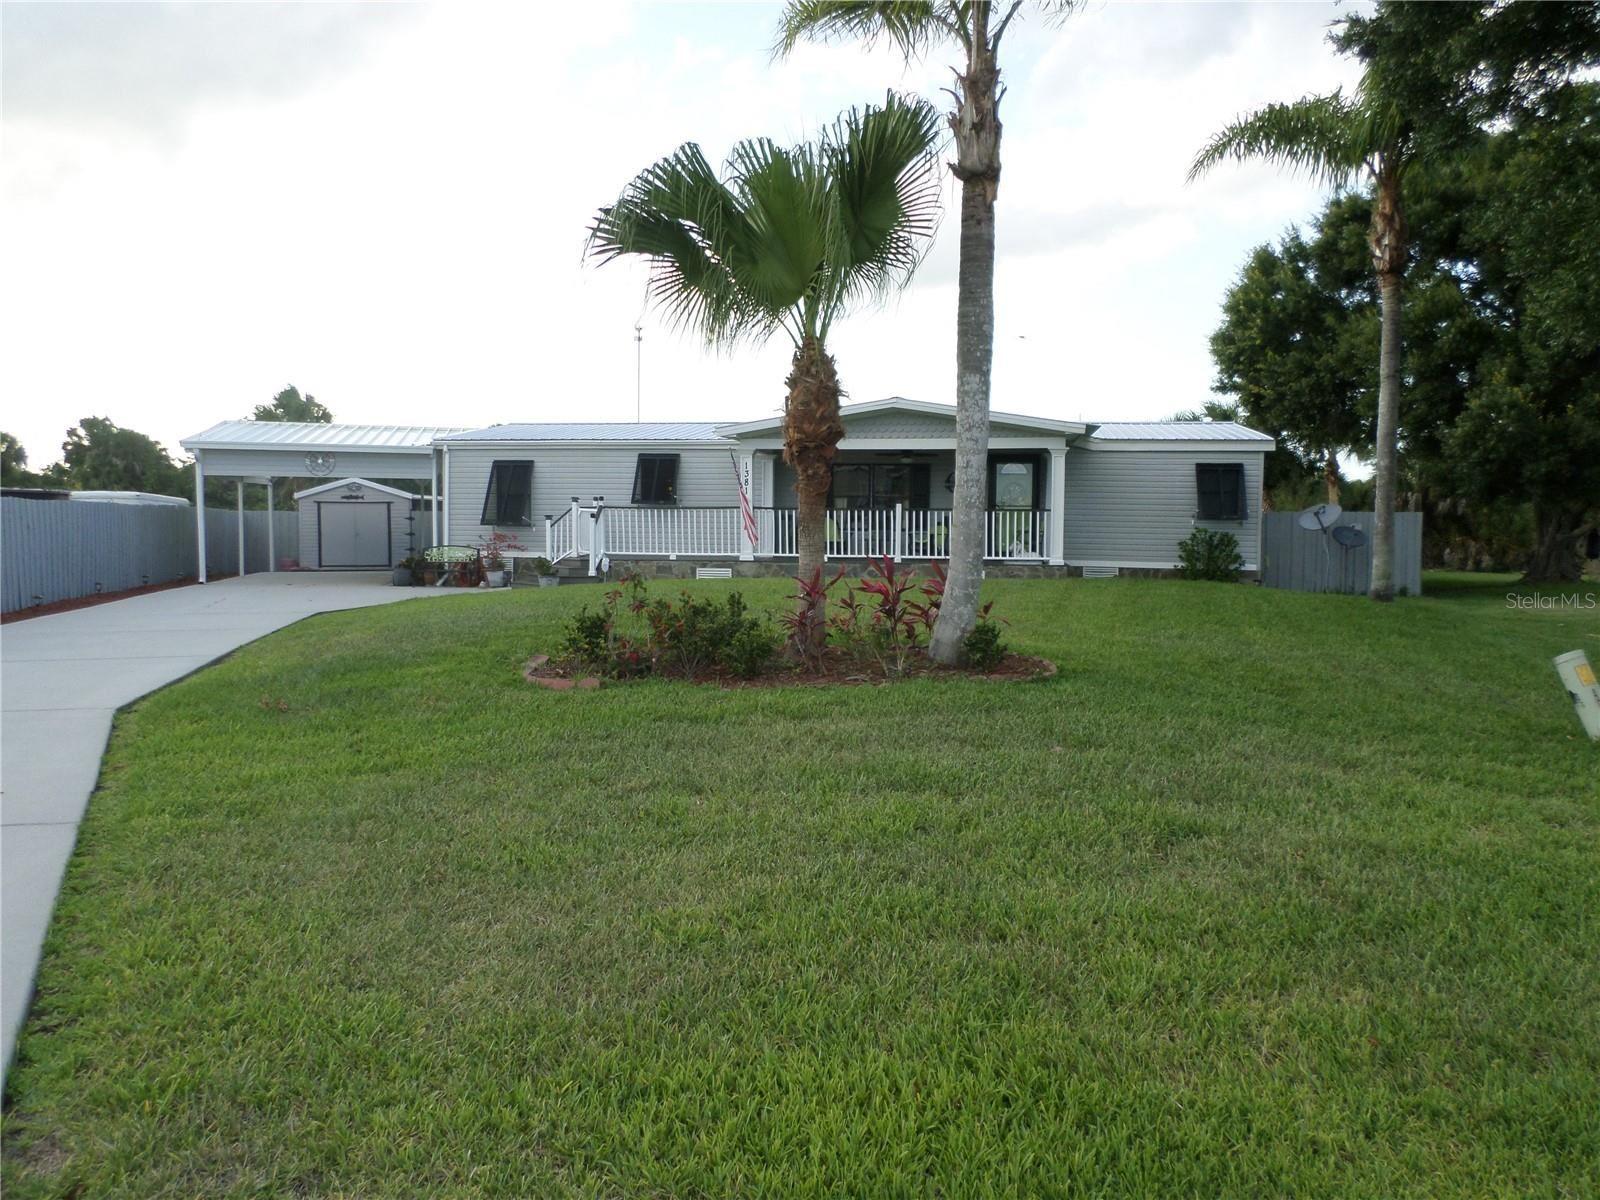 1381 JORDAN LOOP, Okeechobee, FL 34974 - #: OK220195